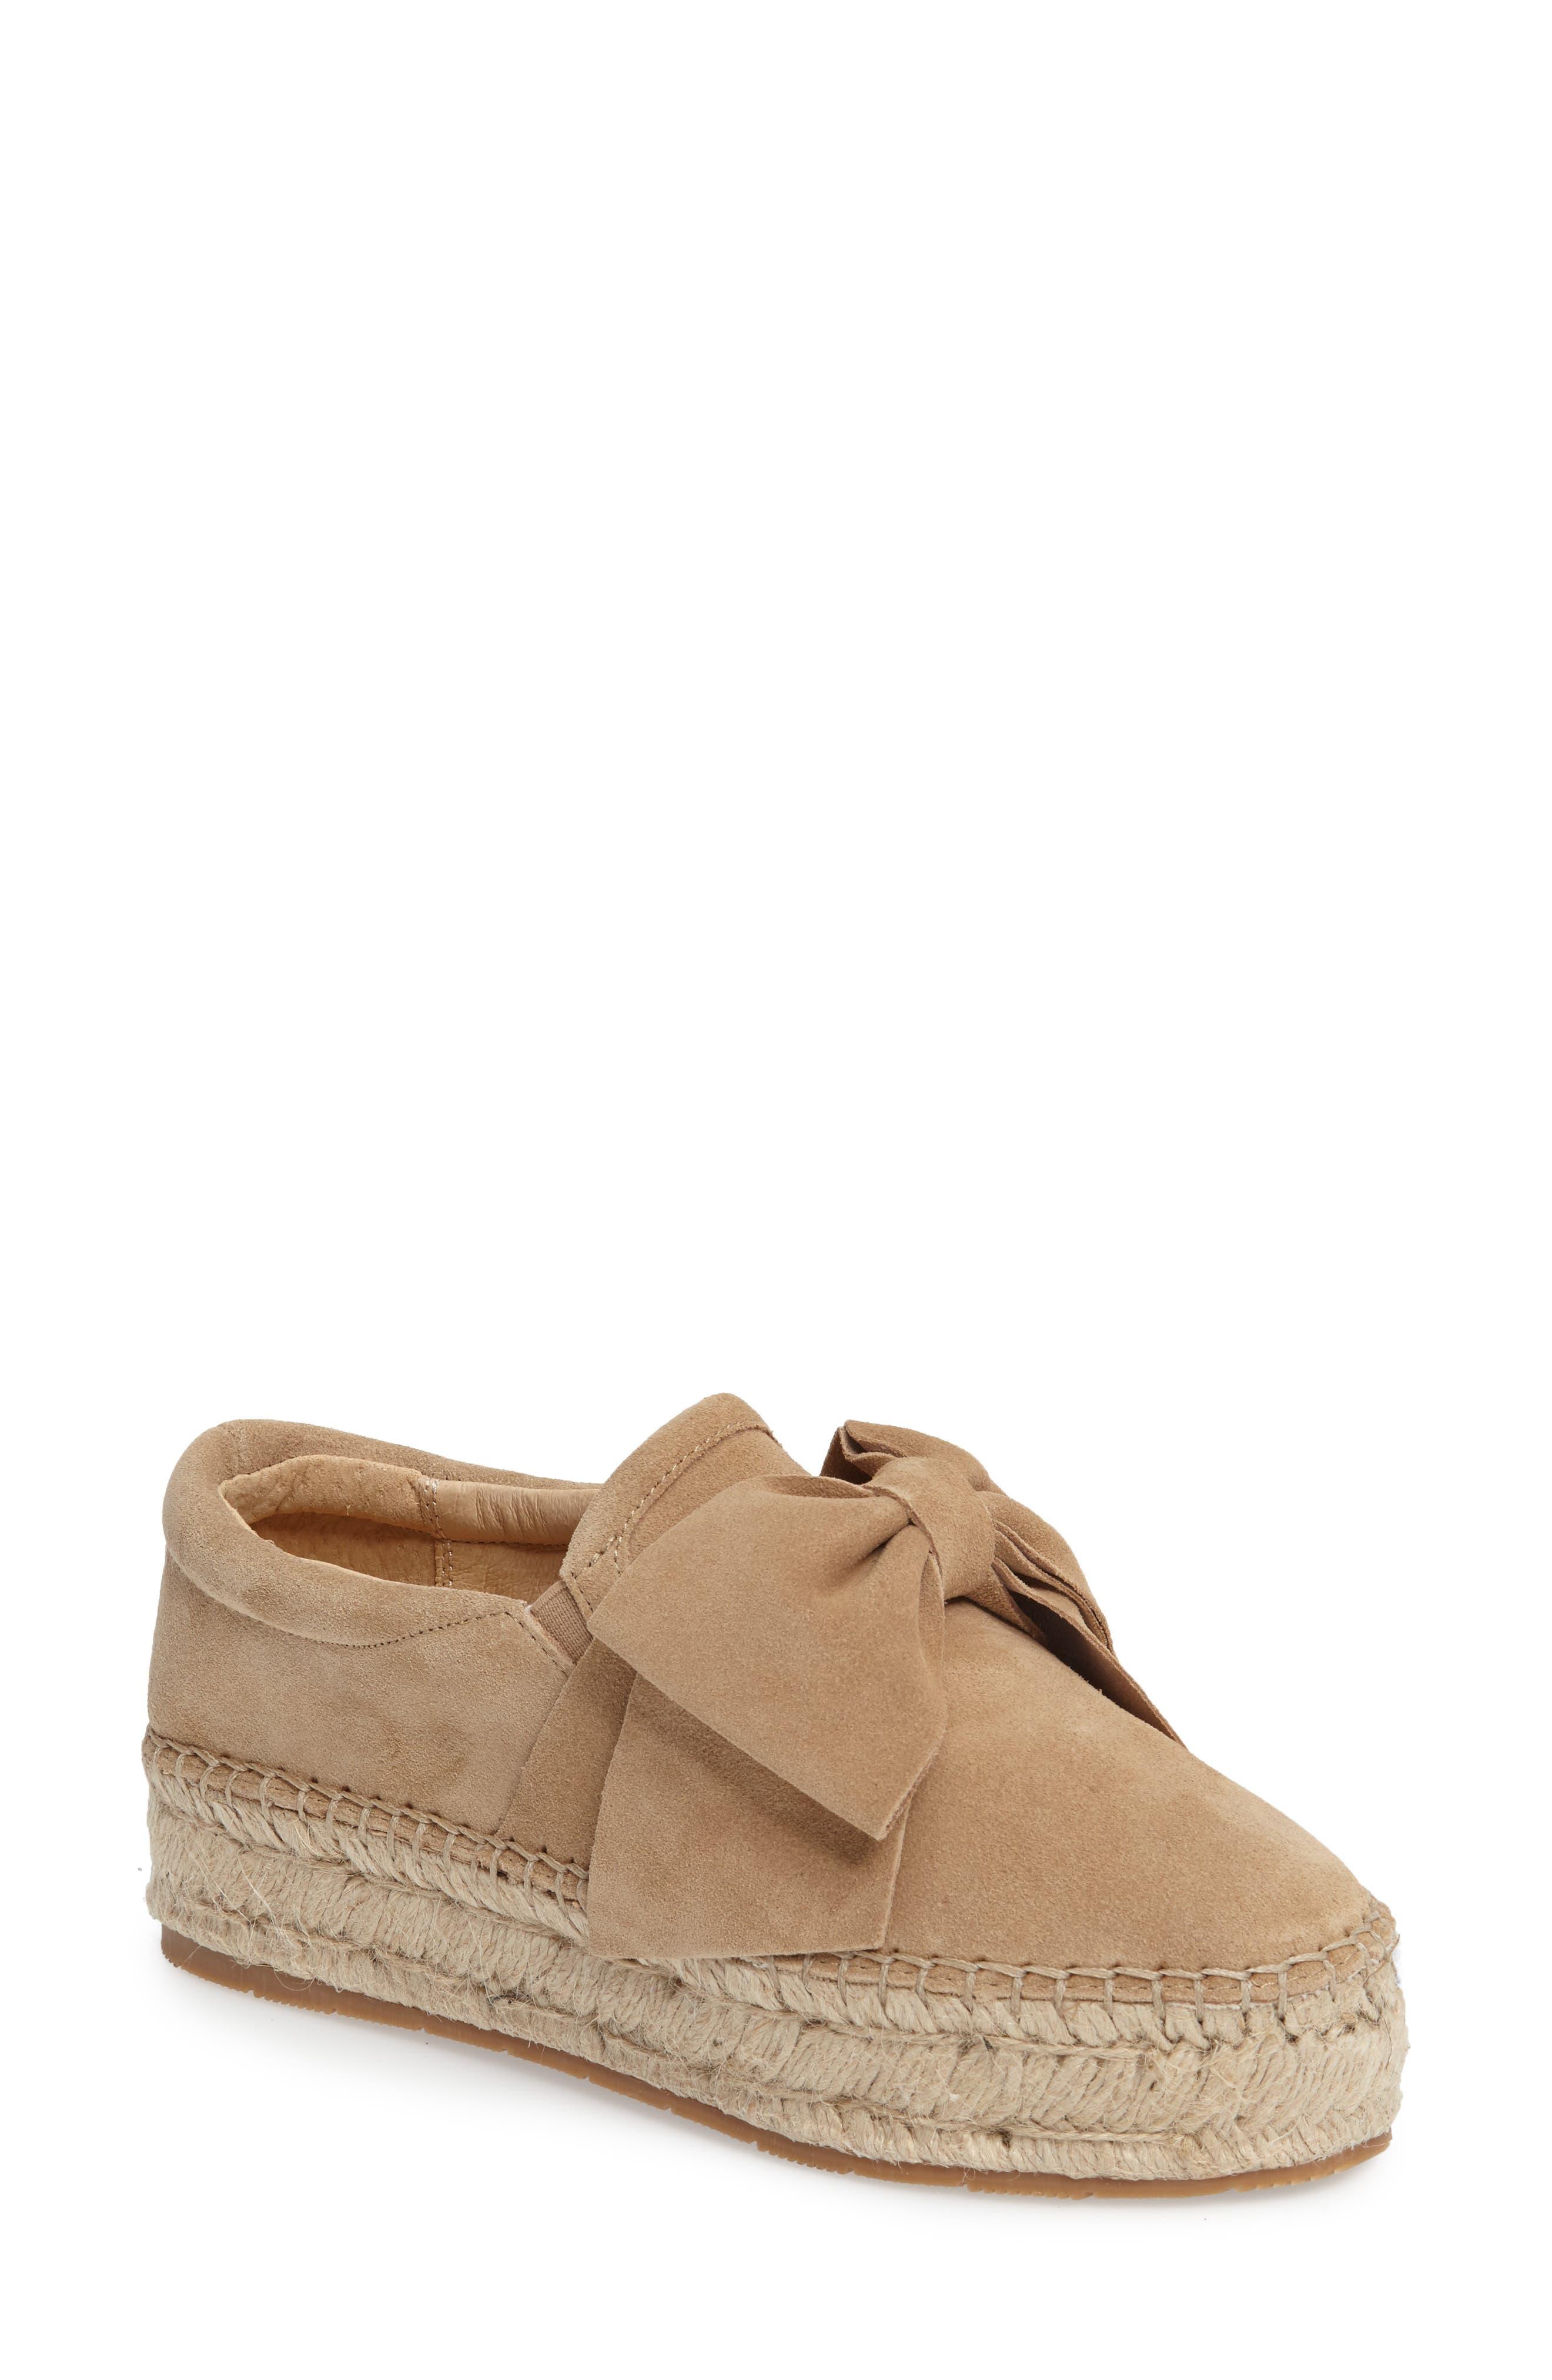 JSlides Rina Espadrille Platform Sneaker (Women)